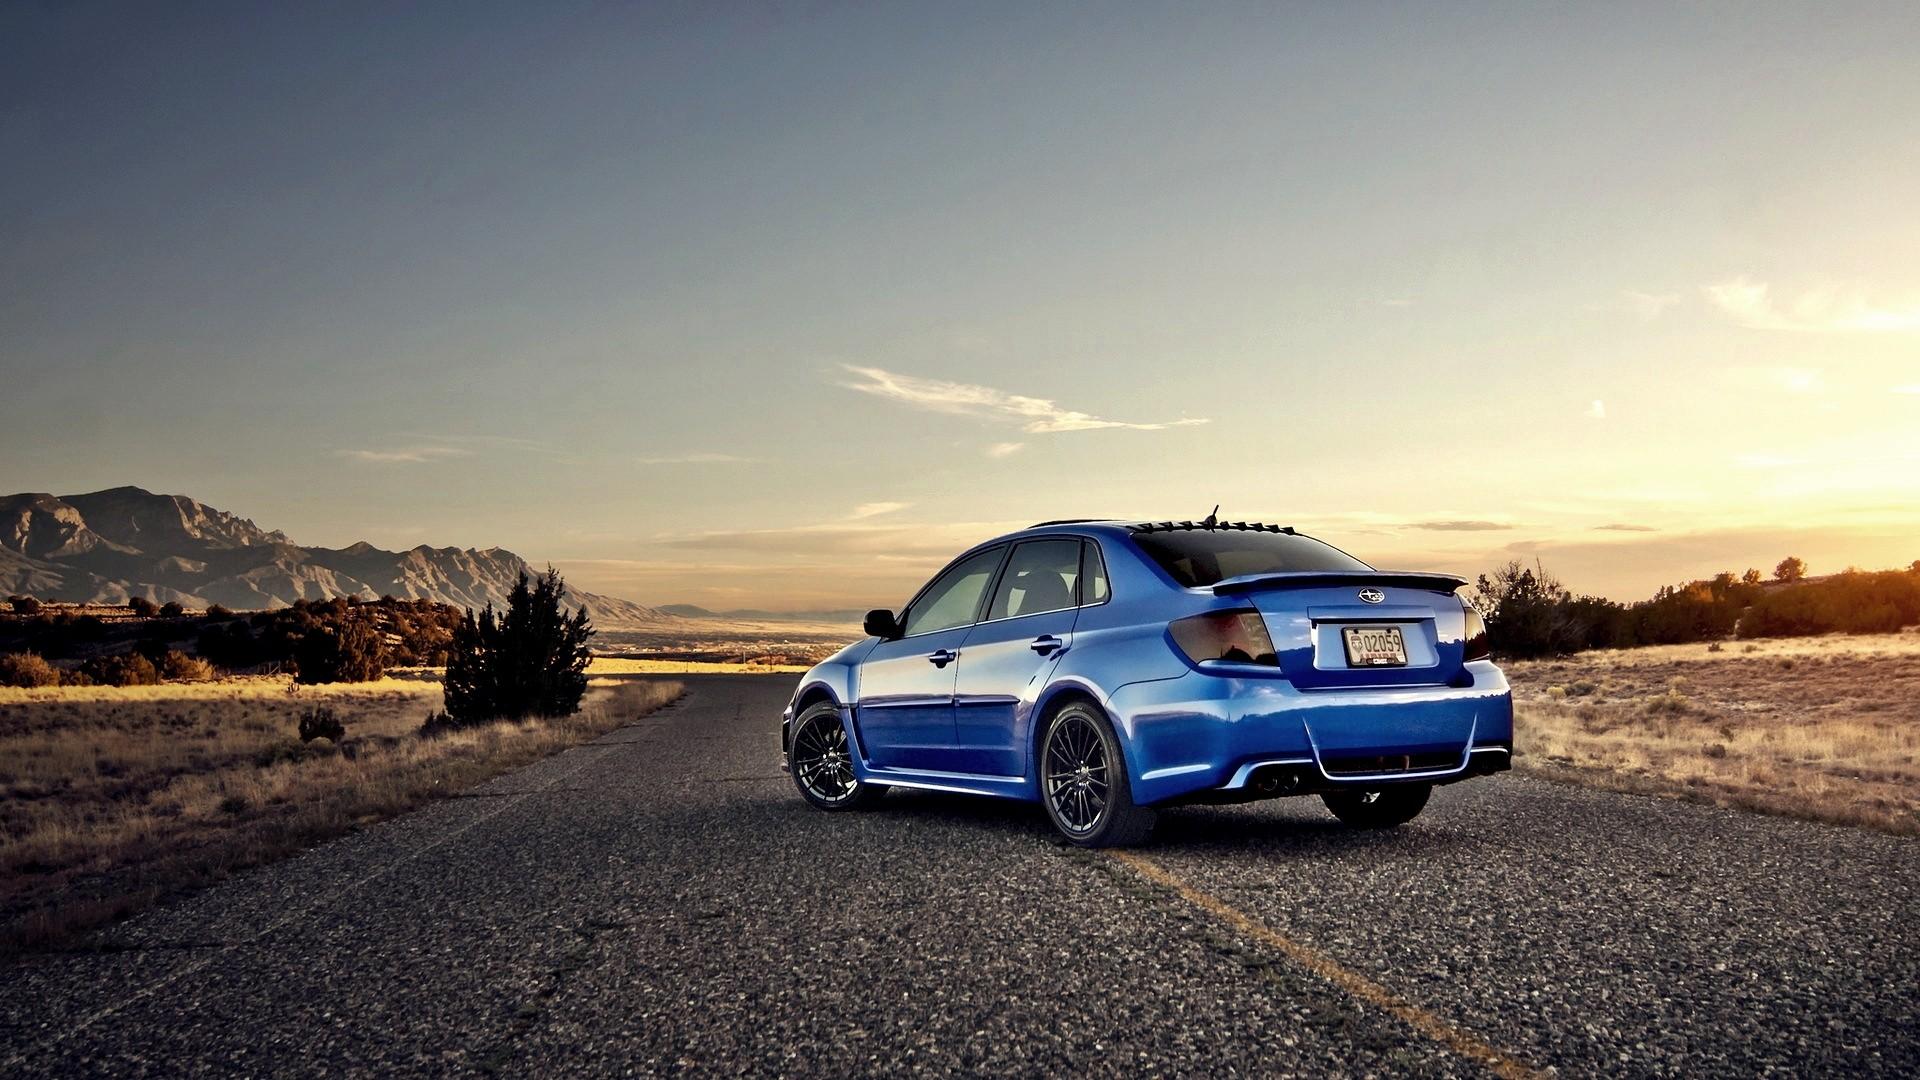 Cars Subaru Roads Vehicles Subaru Impreza Subaru Impreza Wrx Sti